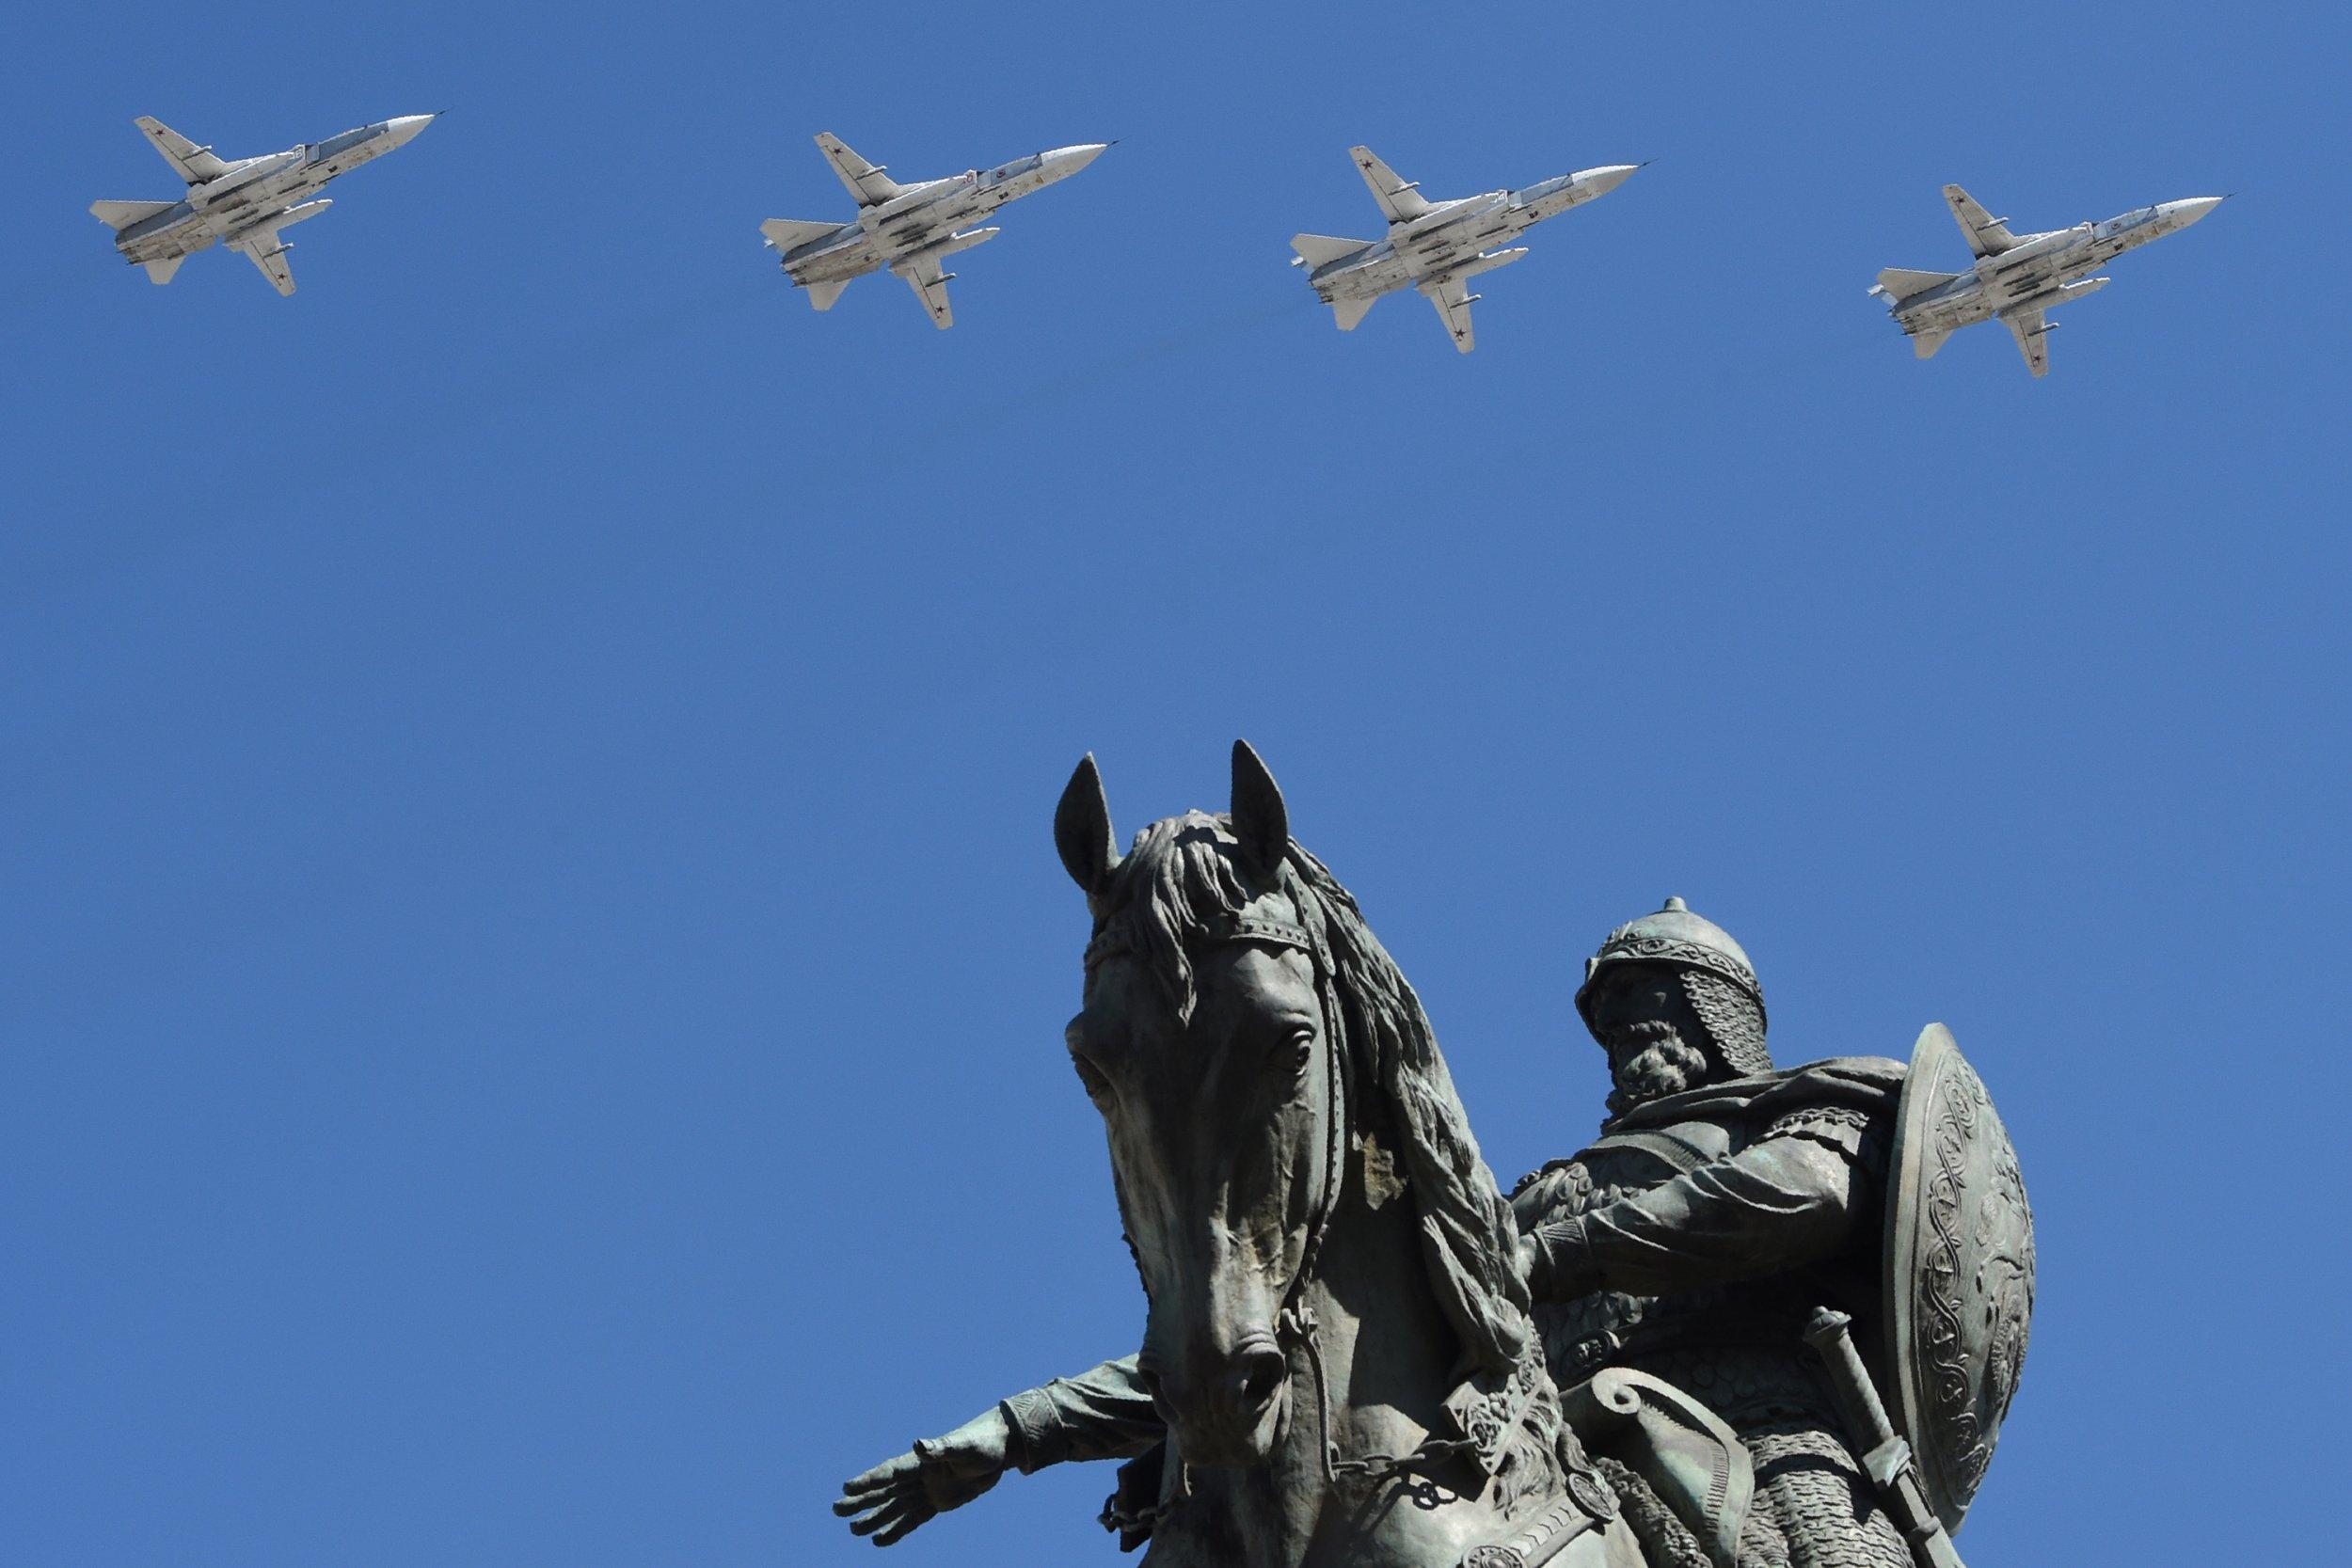 01_23_Russian_interceptor